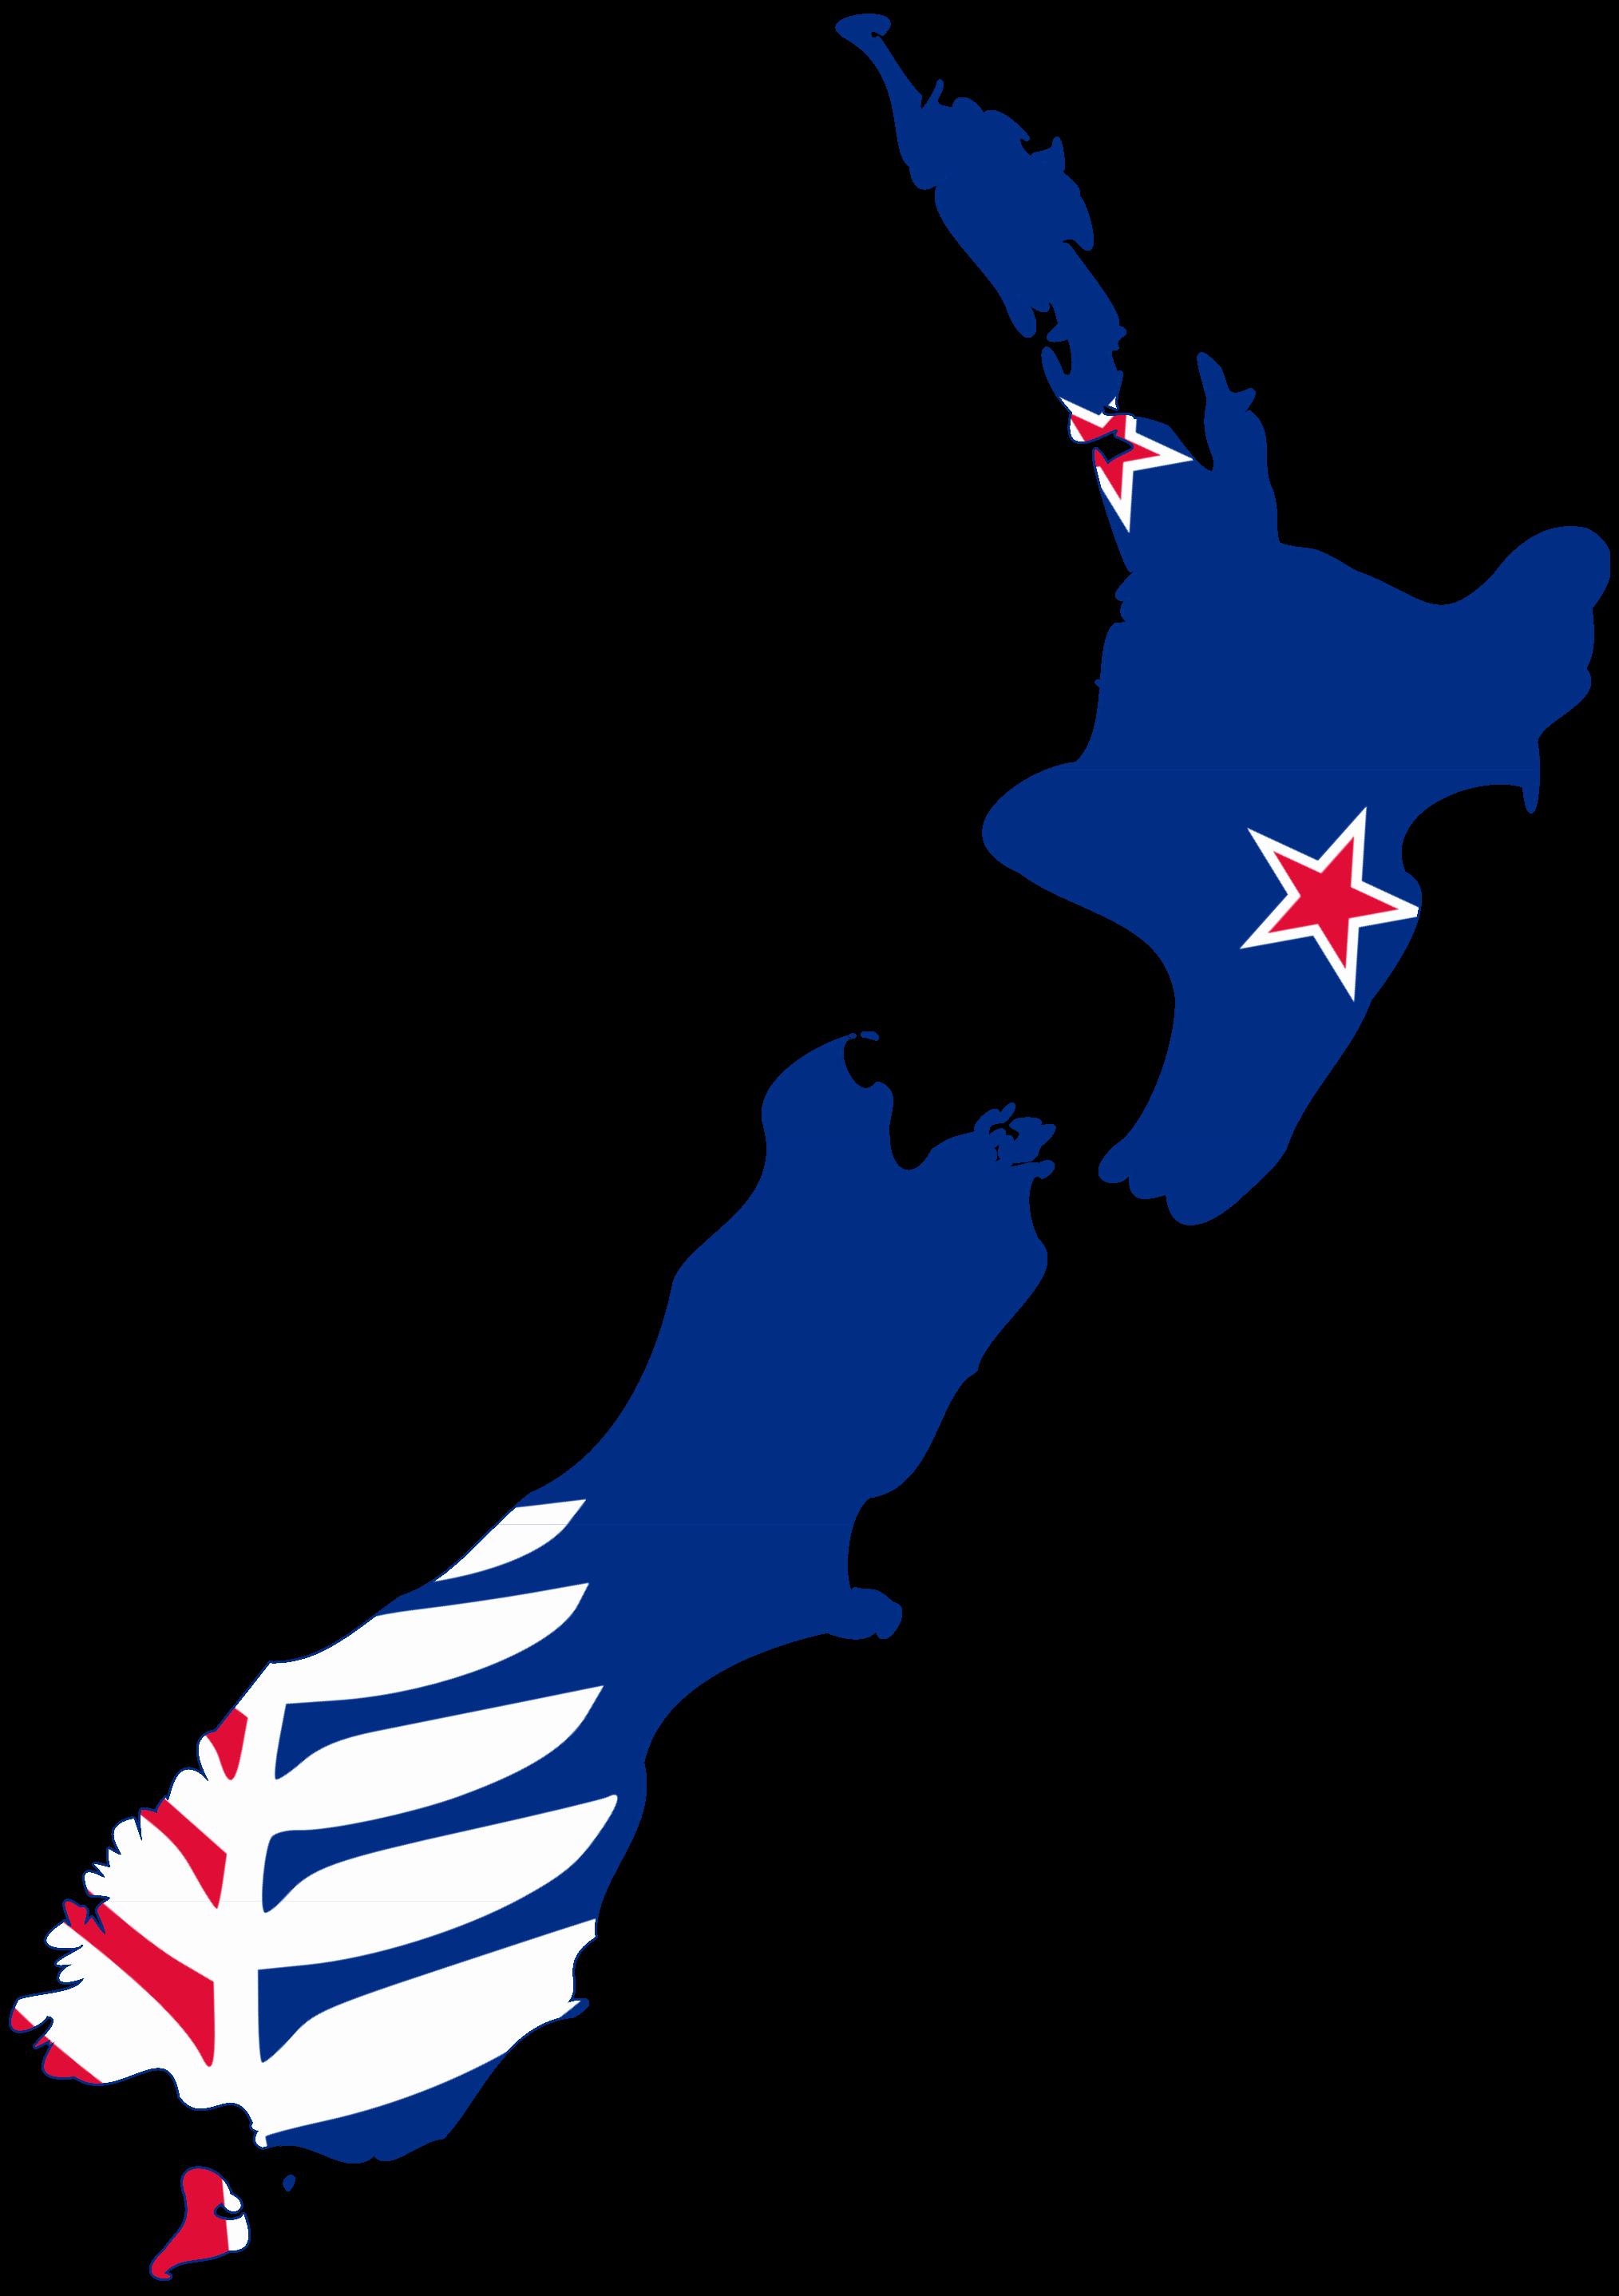 FileFlag Map Of New Zealand Kyle Lockwood Proposalpng - New zealand map png